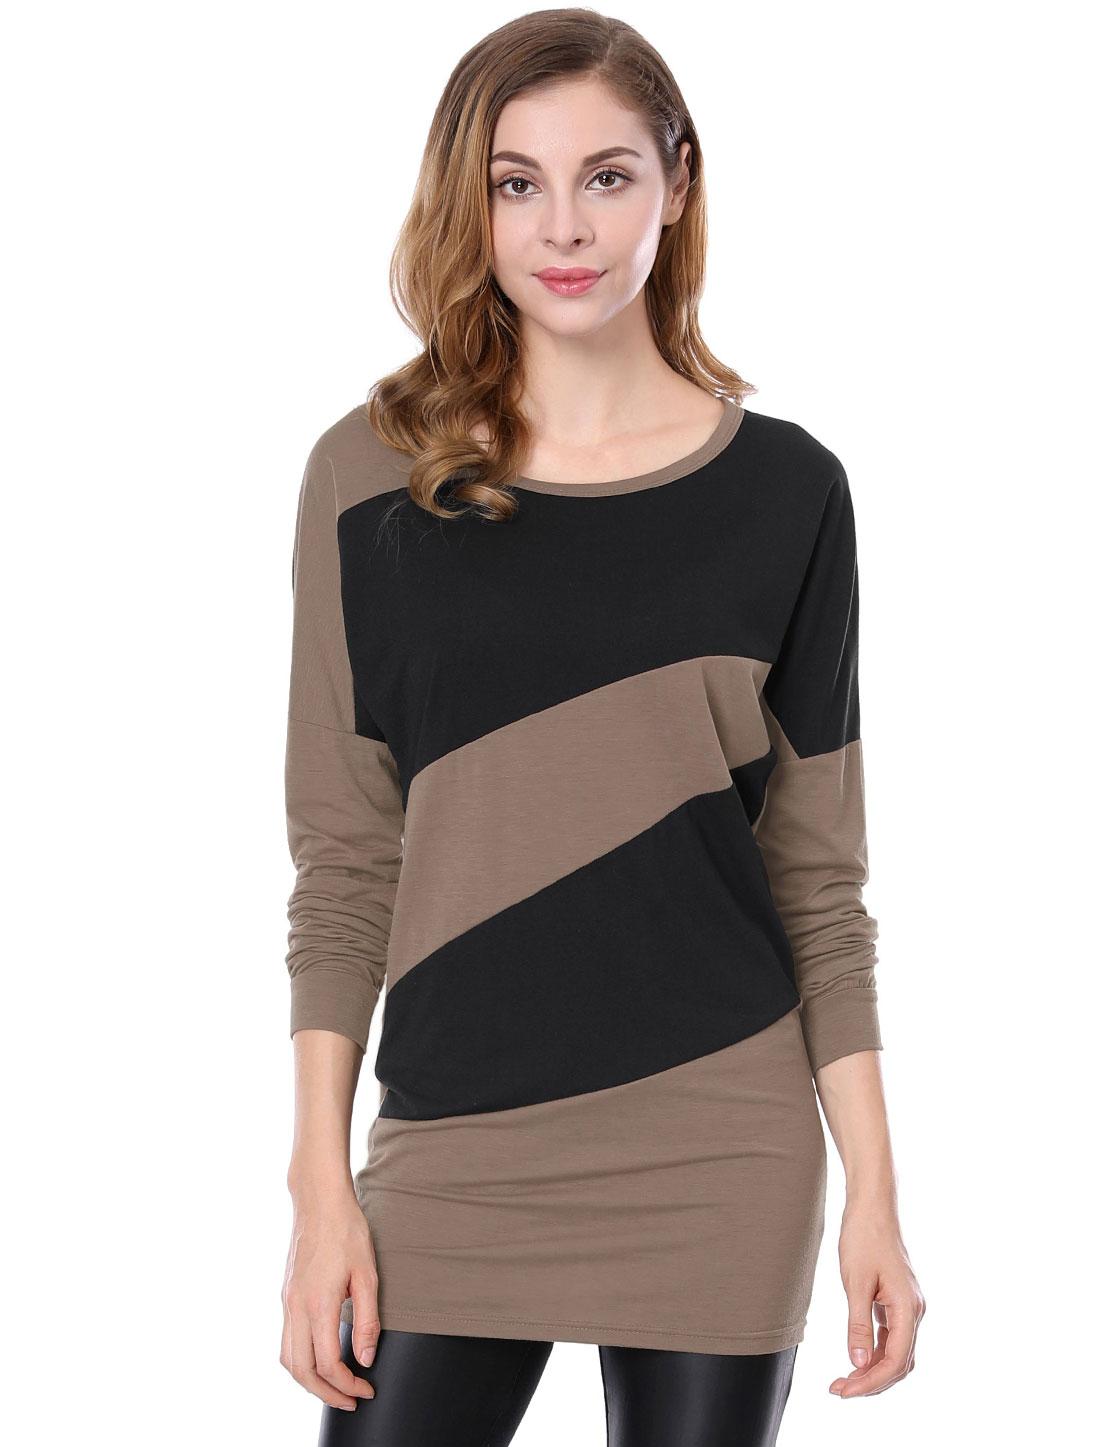 Ladies Chic Scoop Neck Long Bat Wing Sleeve Light Coffee Black Shirt XS